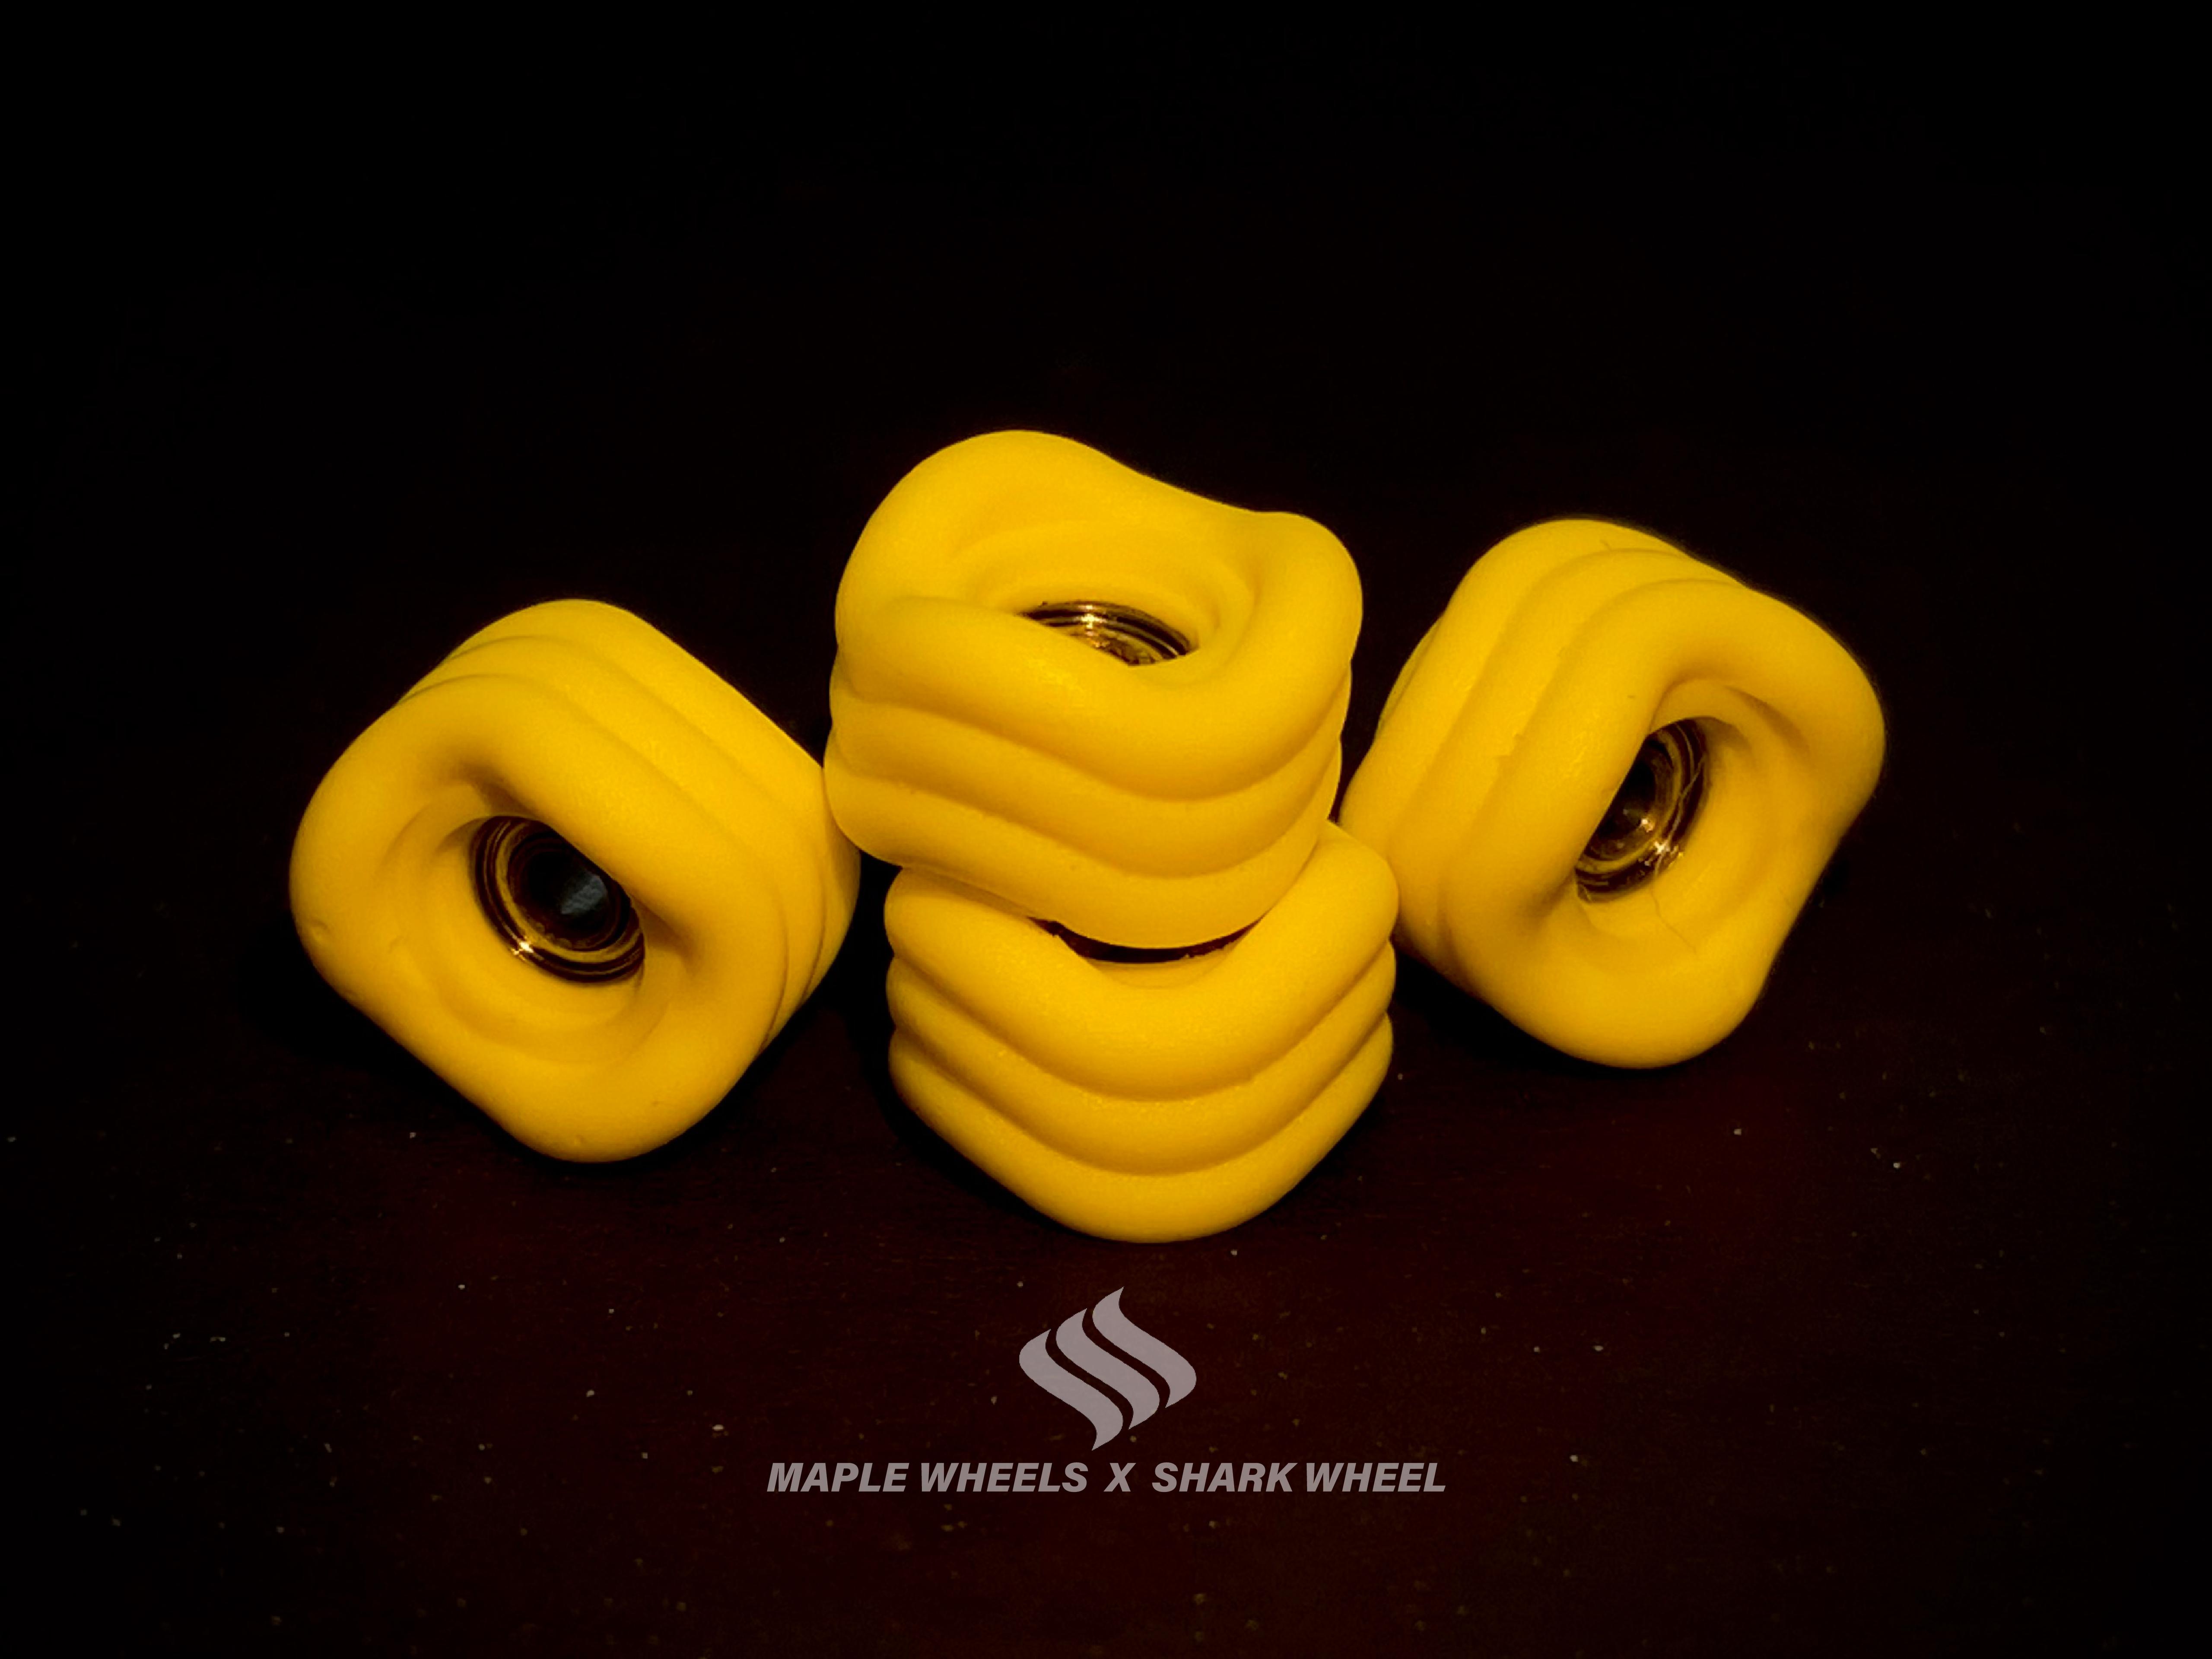 Shark Wheel Fingerboard Wheels (Limited Edition - Wheels Only)